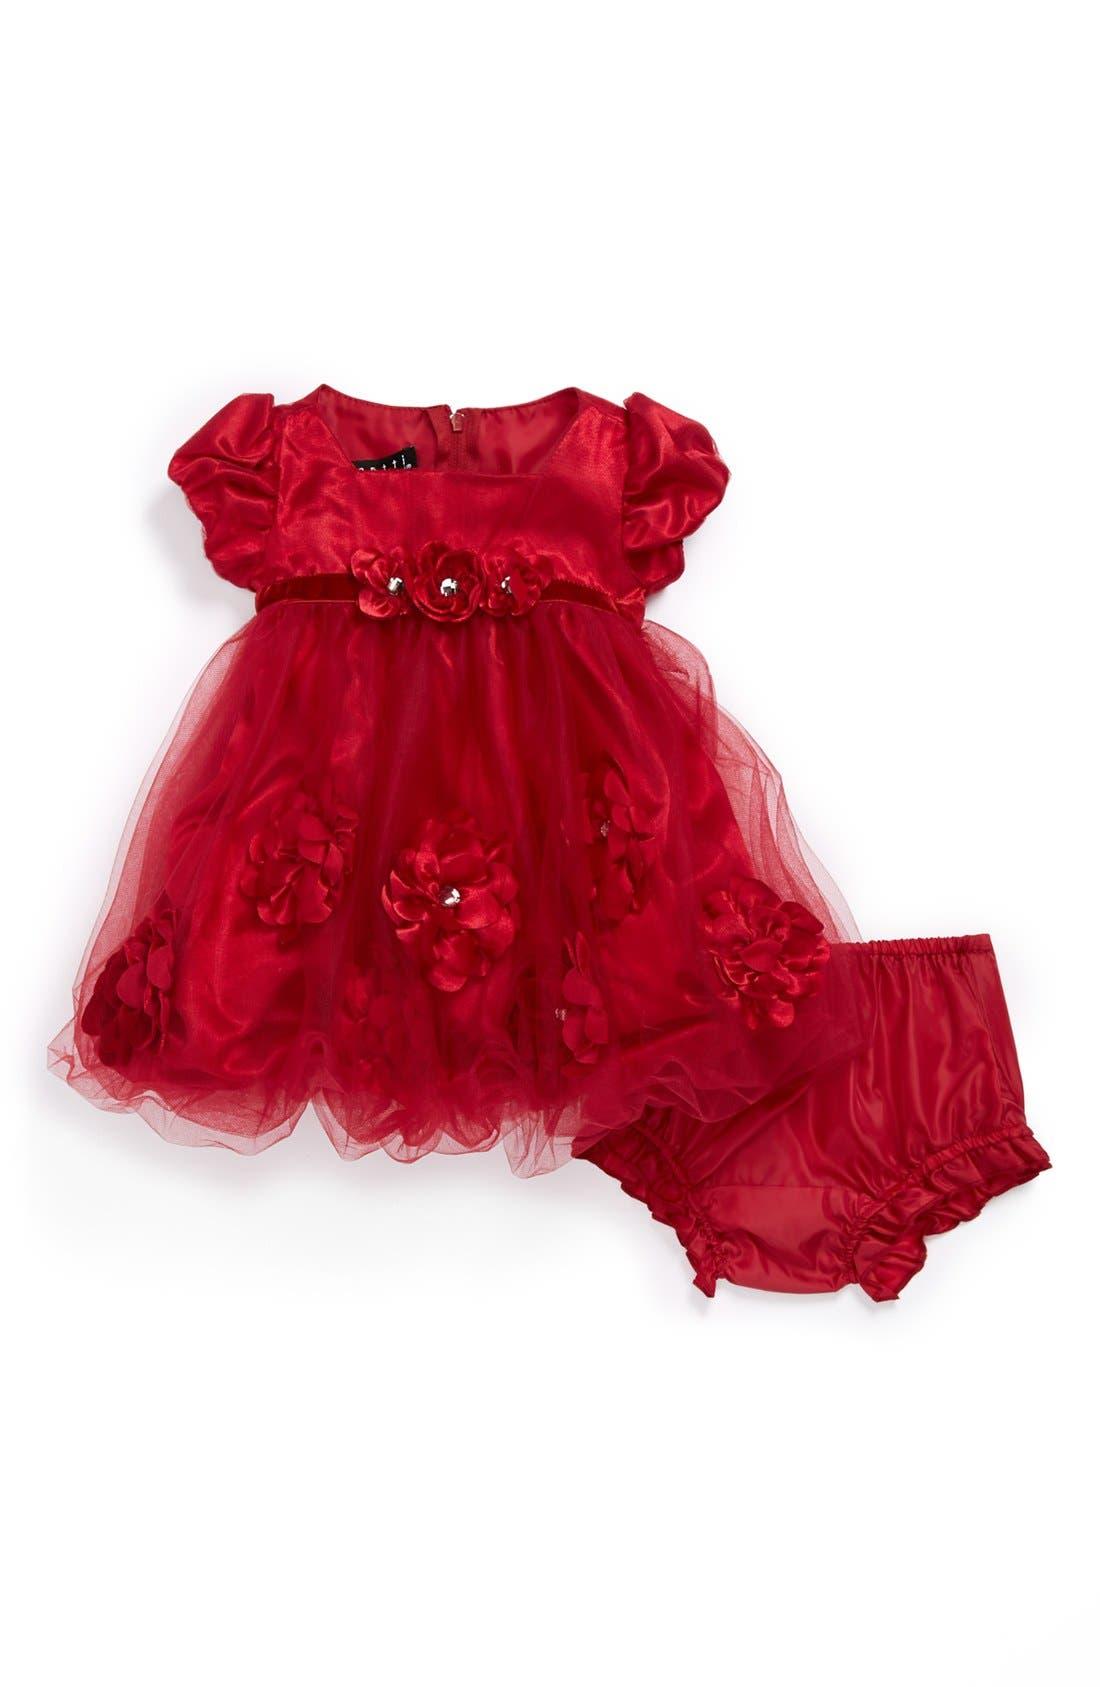 Main Image - Biscotti 'Posies' Bubble Dress & Bloomers (Baby Girls)